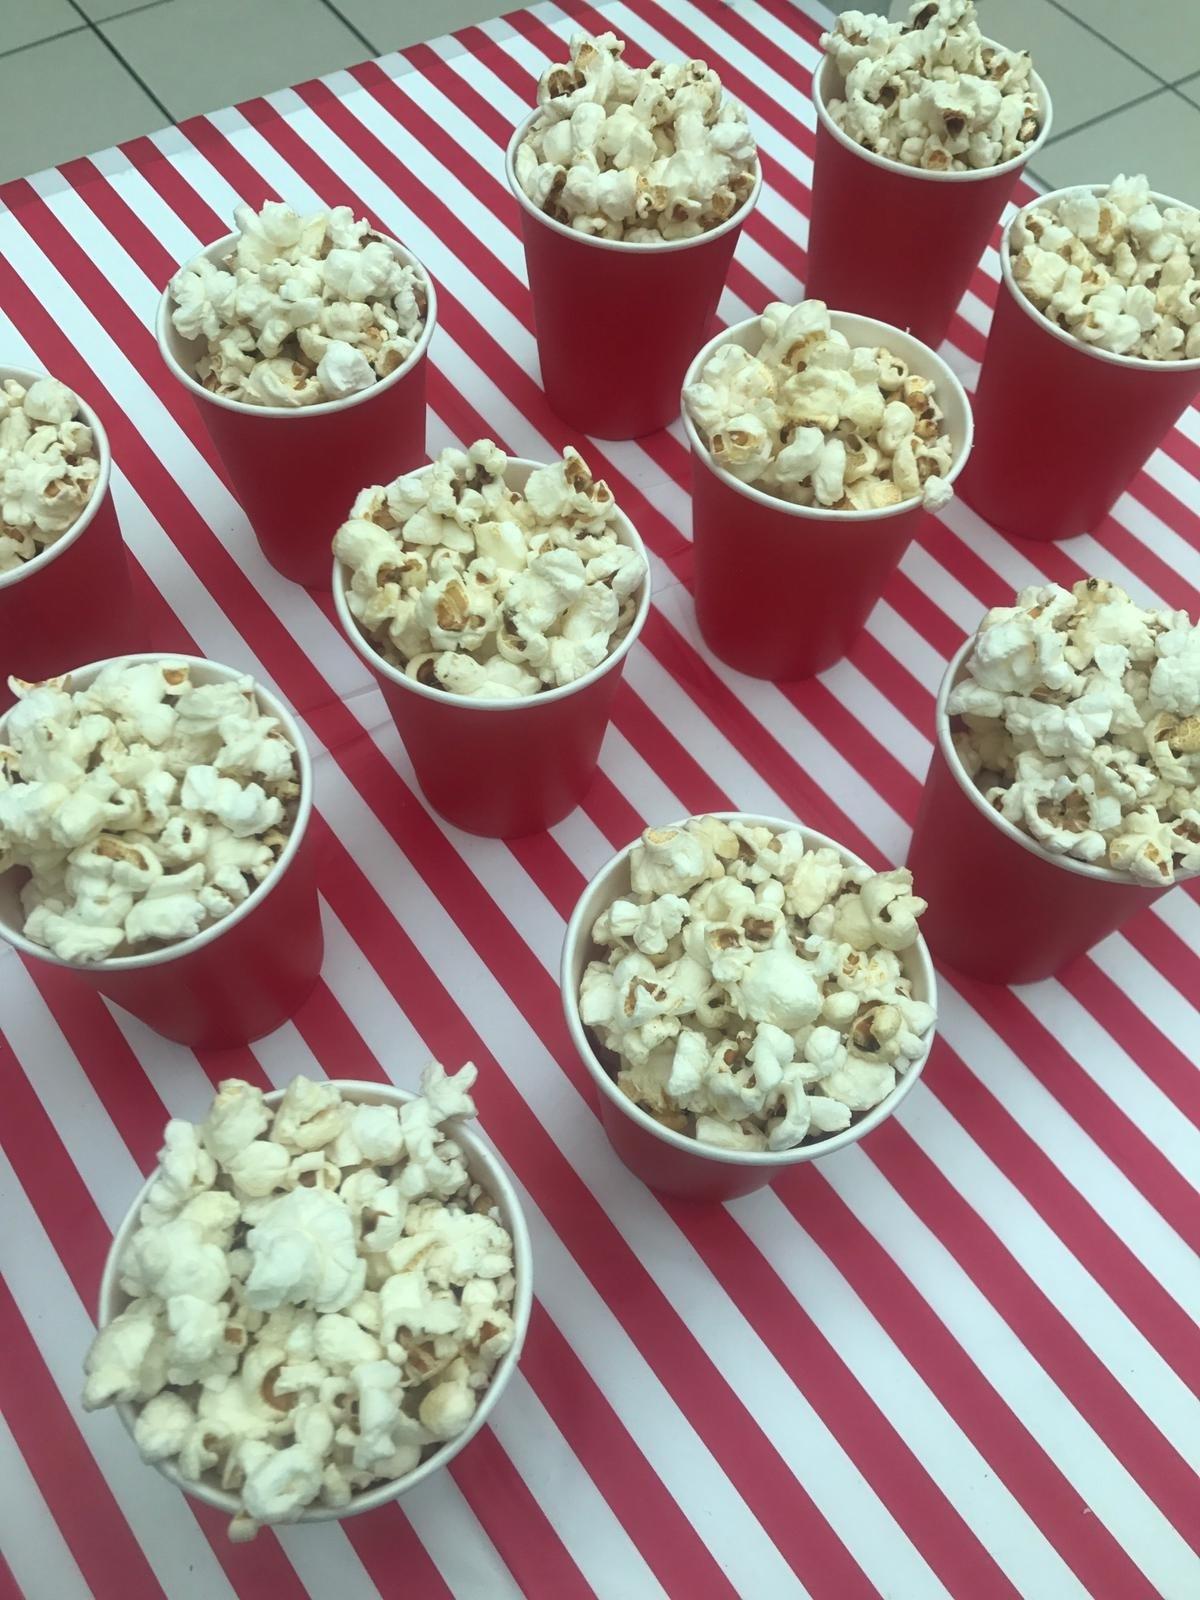 Popcorn at the ready as councillors classify Italian rom com for Bradford on Avon film society